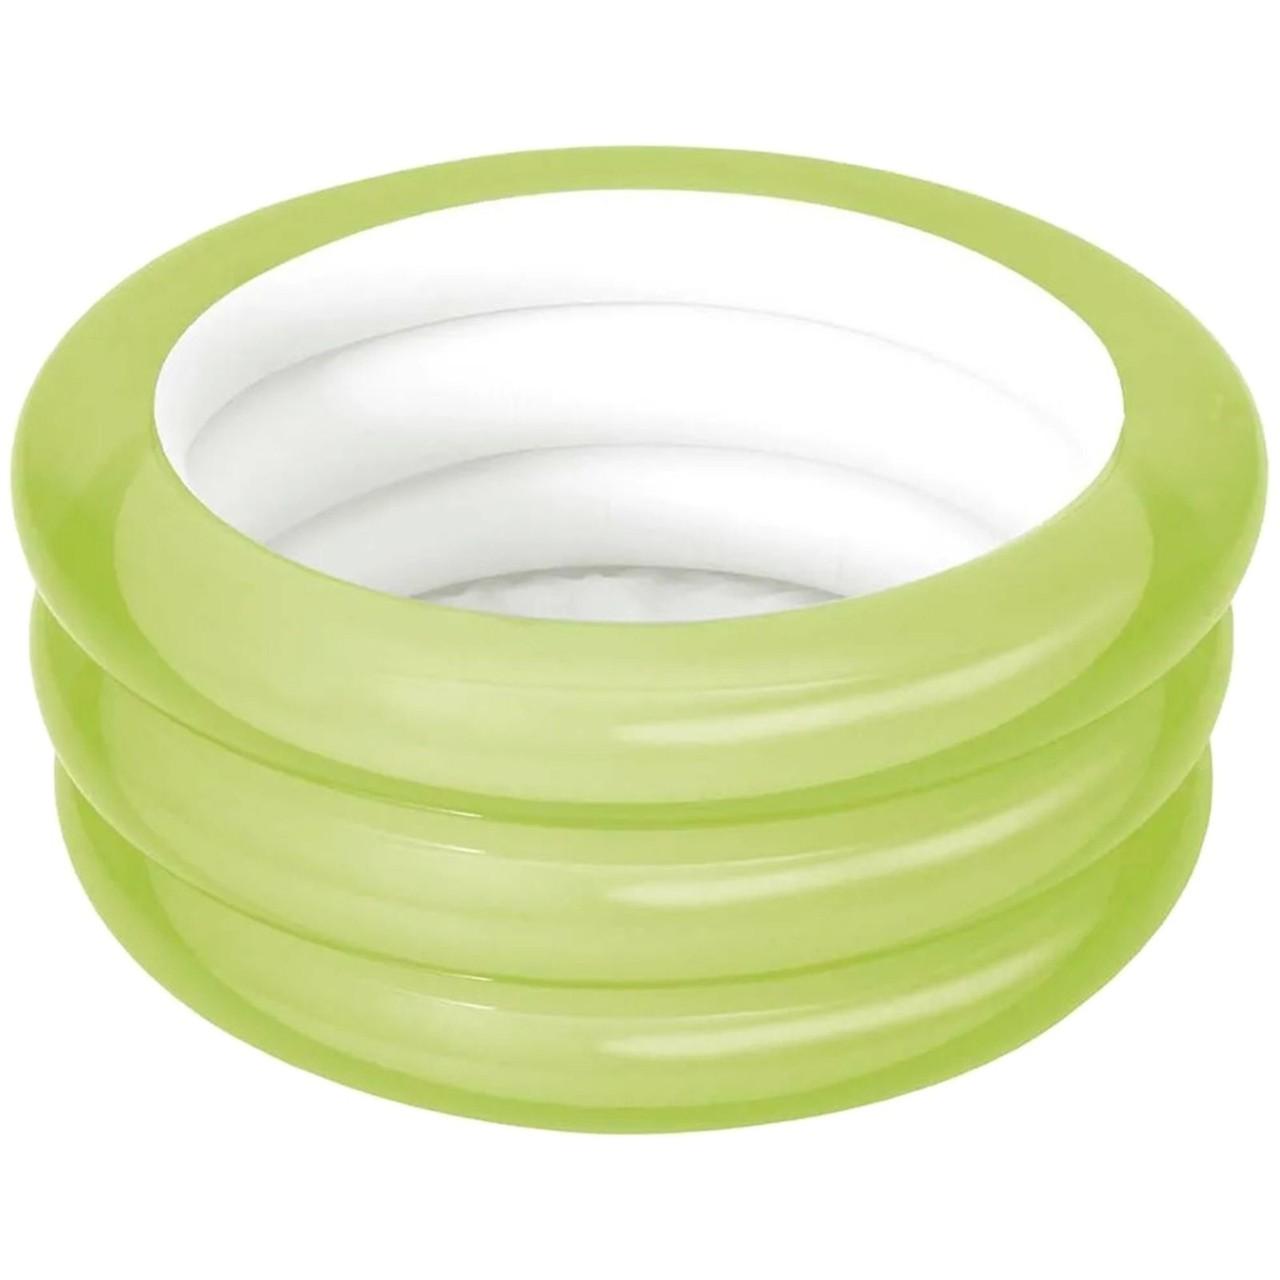 Banheira Infantil Piscina Inflável Verde 80 Litros Mor